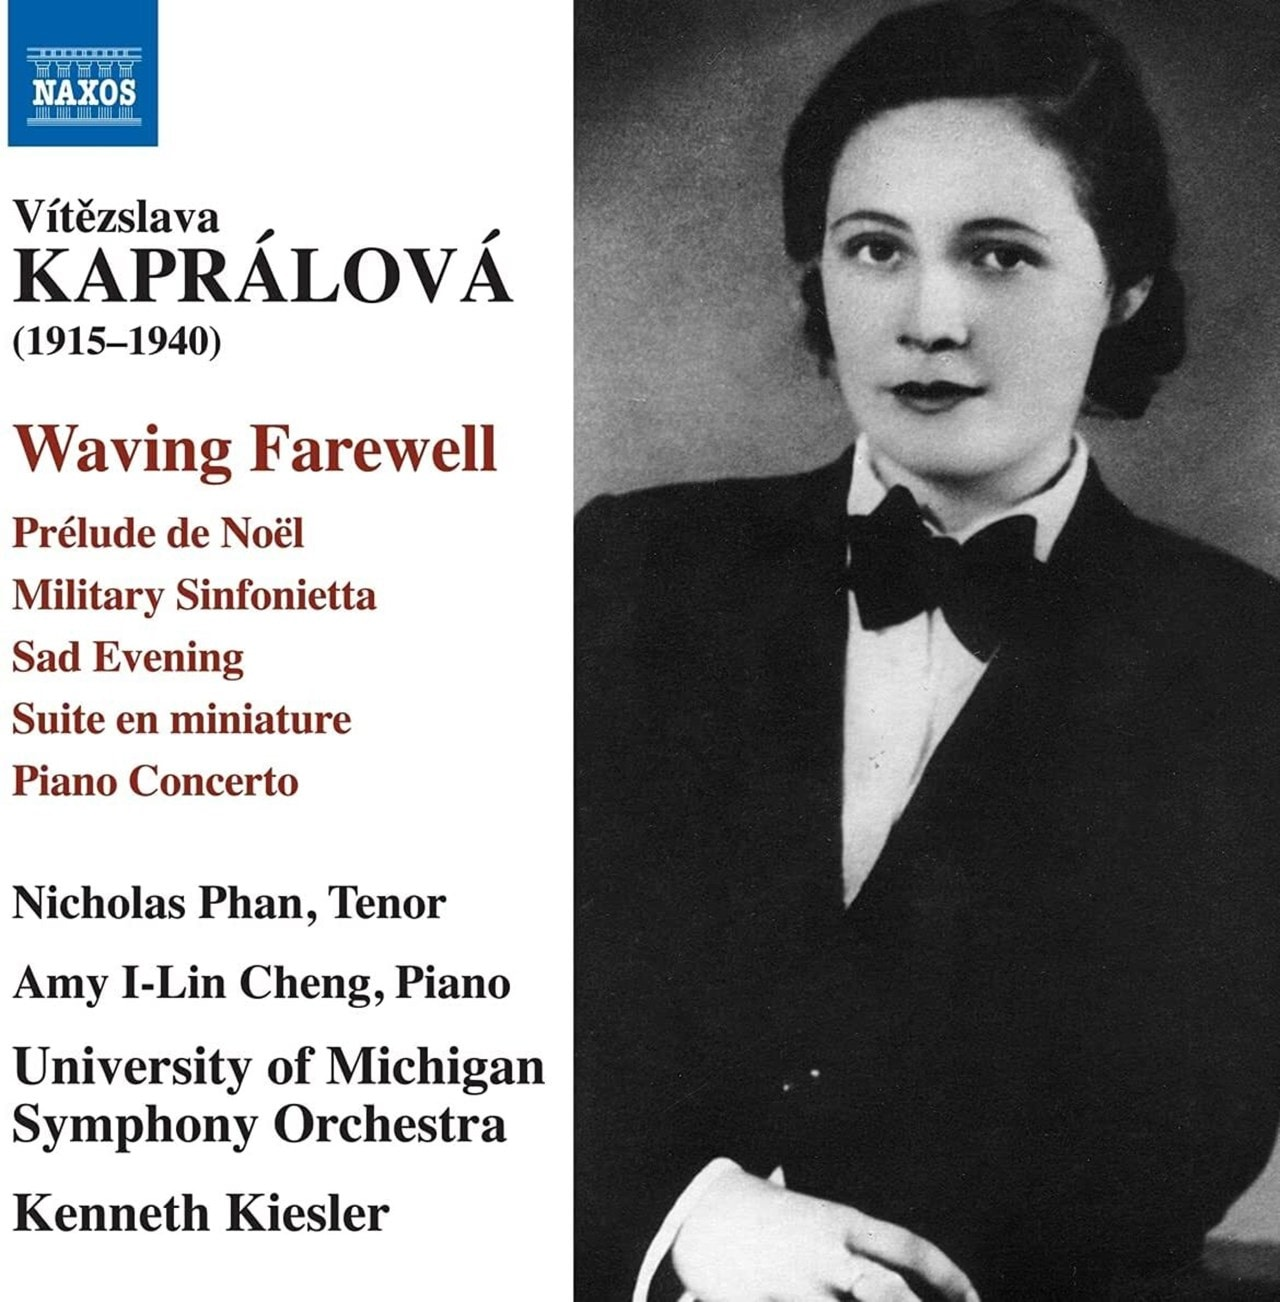 Vitezslava Kapralova: Waving Farewell - 1